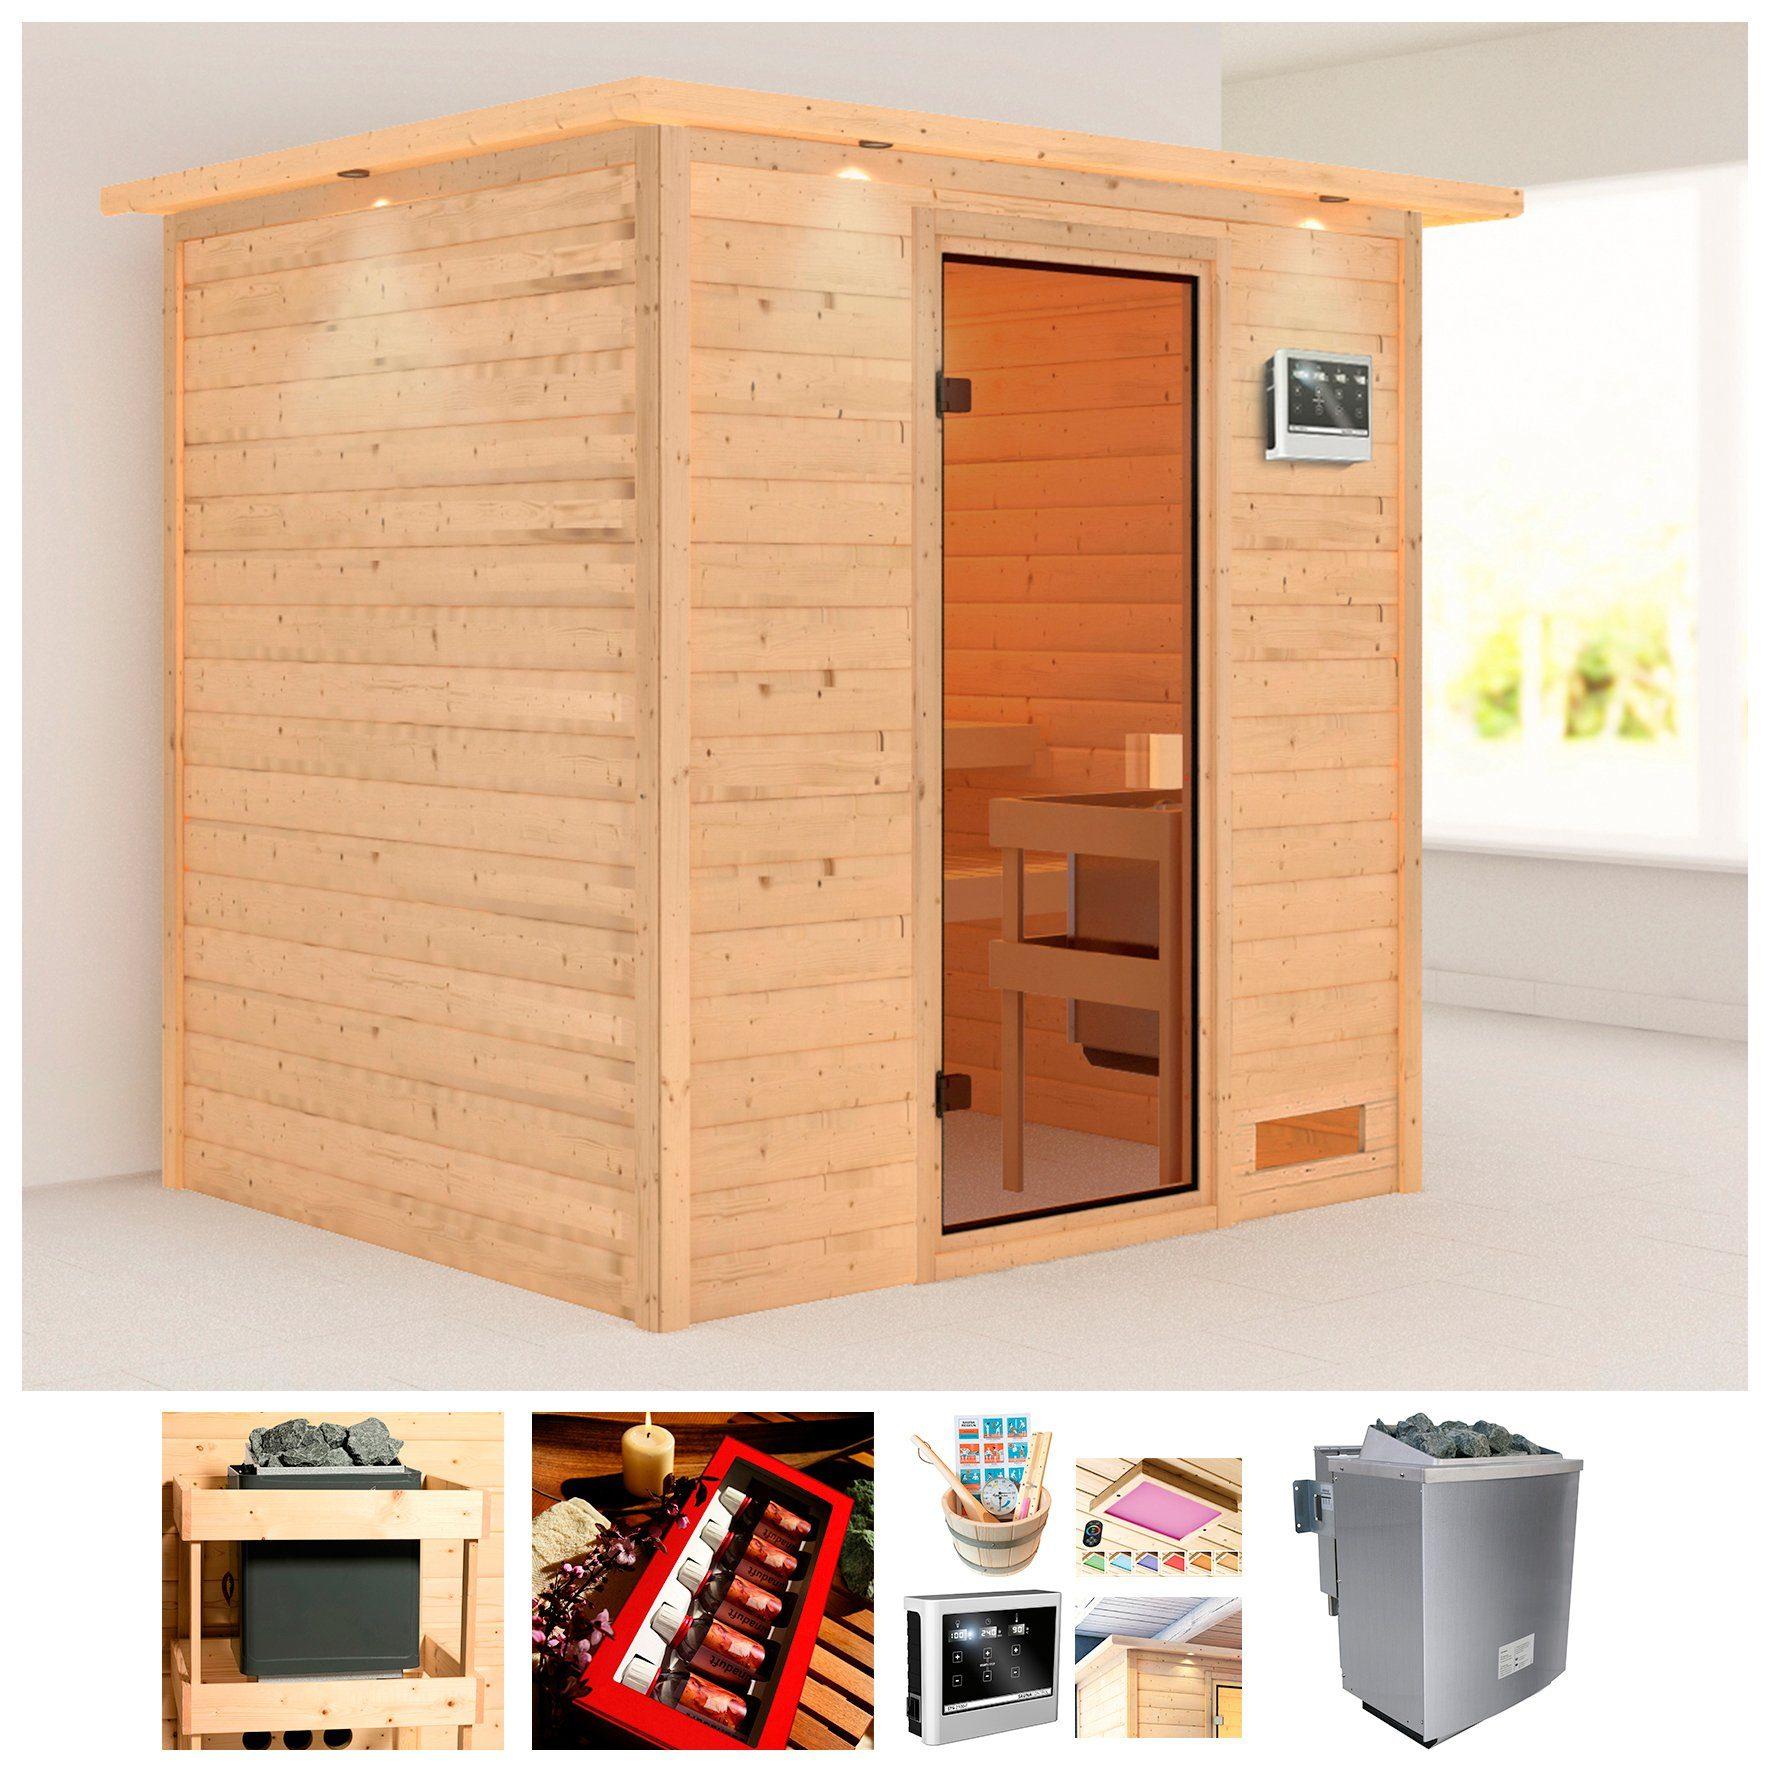 KARIBU Sauna »Ricky«, BxTxH: 224x184x191 cm, 9 kW Bio-Kombiofen mit ext. Steuerung